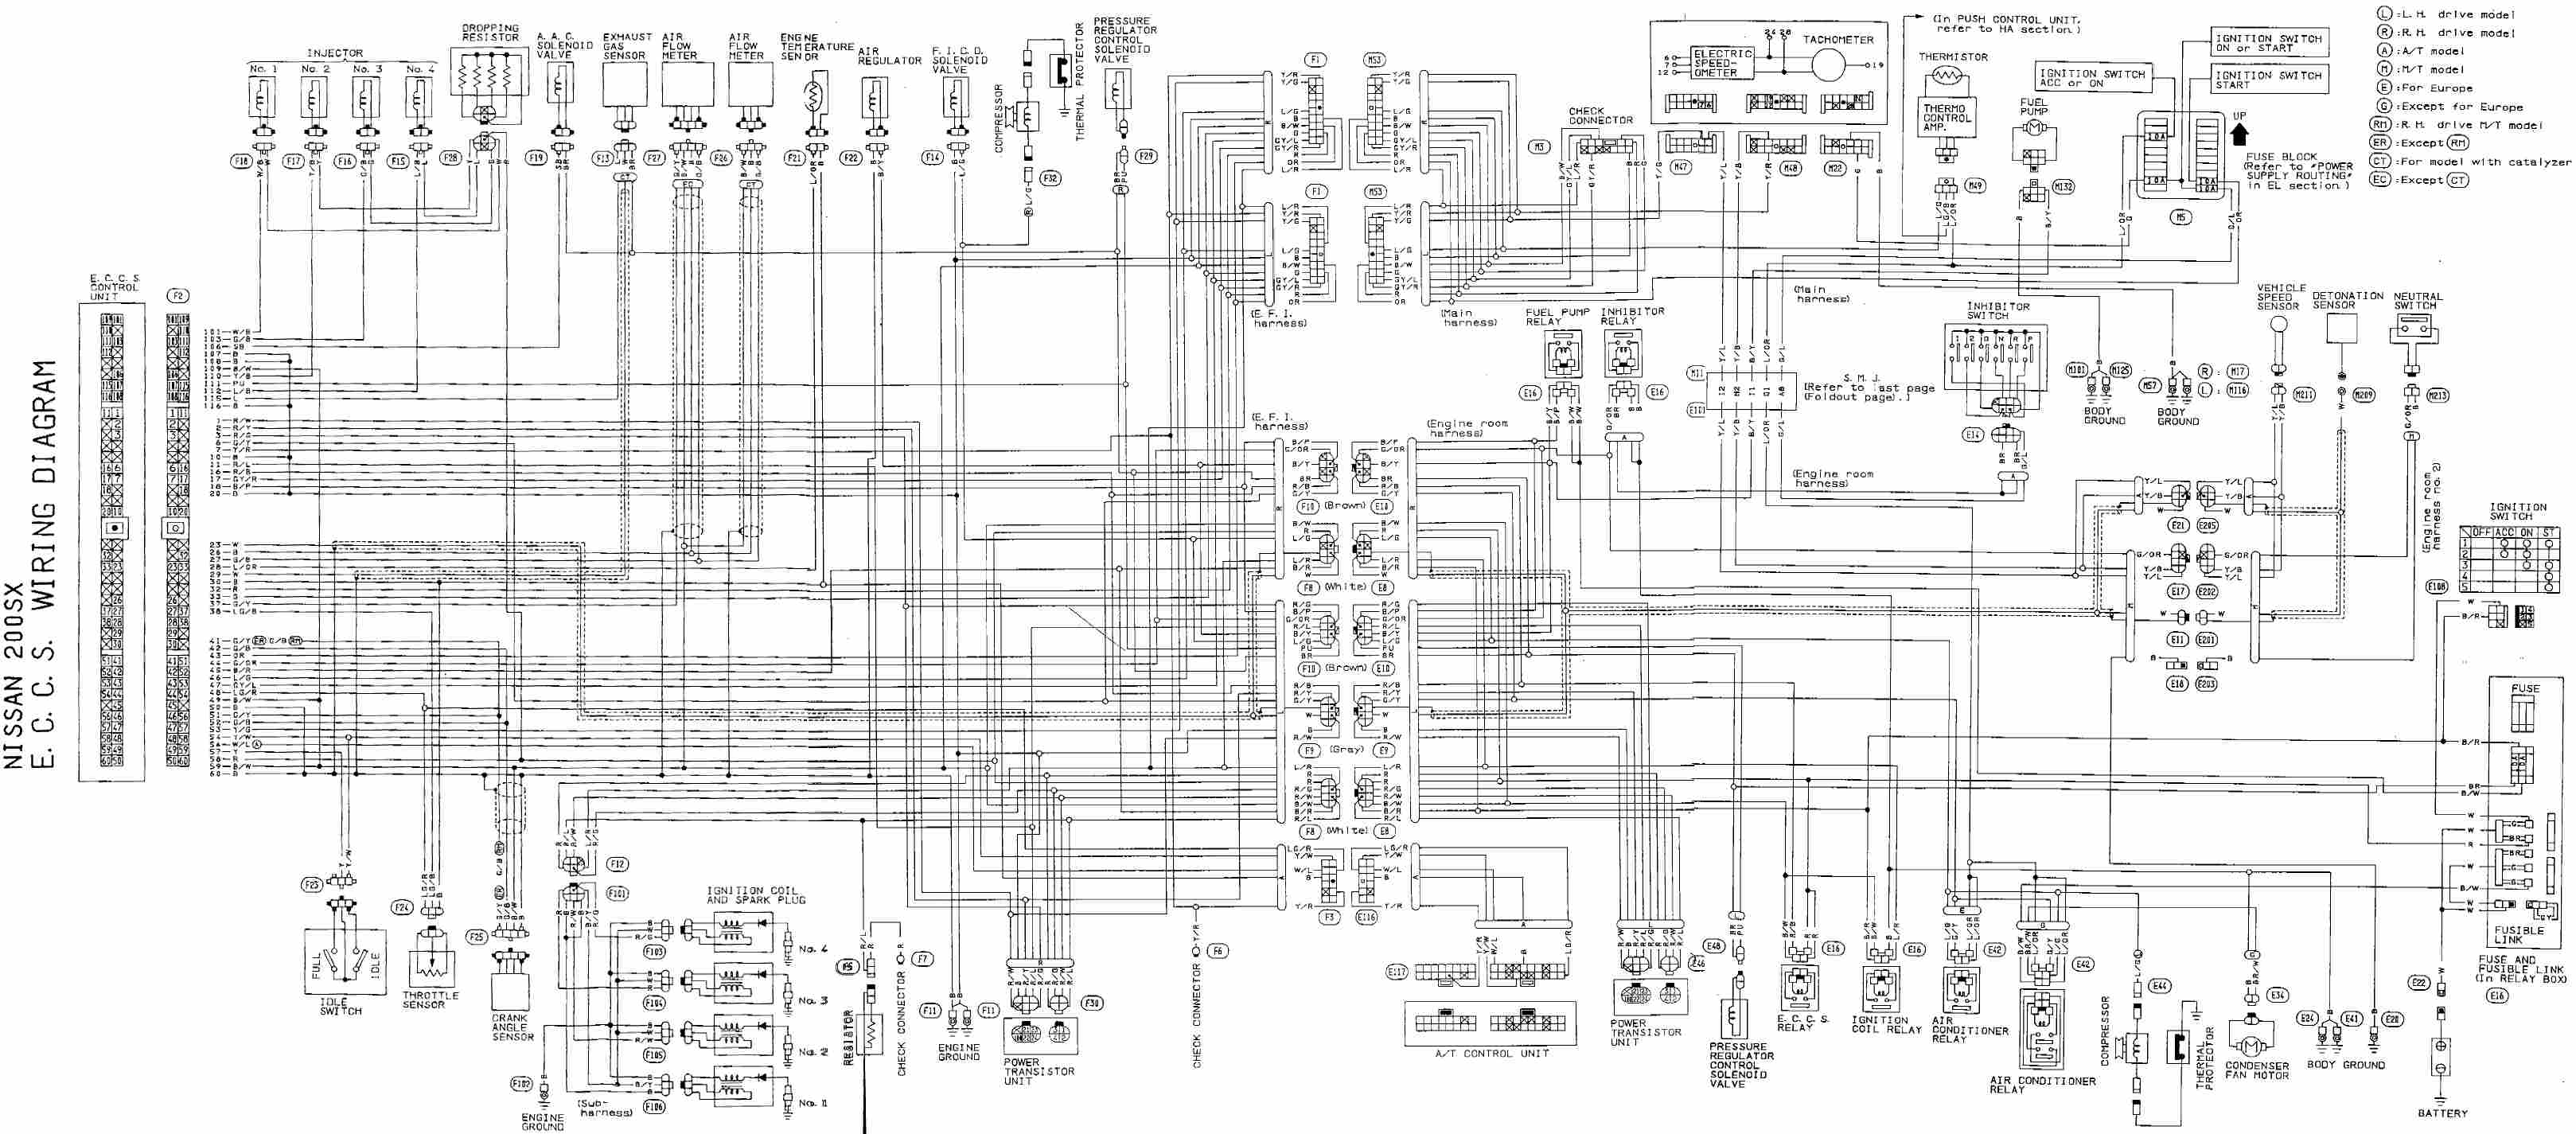 2010 Nissan Cube Fuse Box Location Basic Guide Wiring Diagram Engine 2009 Radiator Rogue Panel